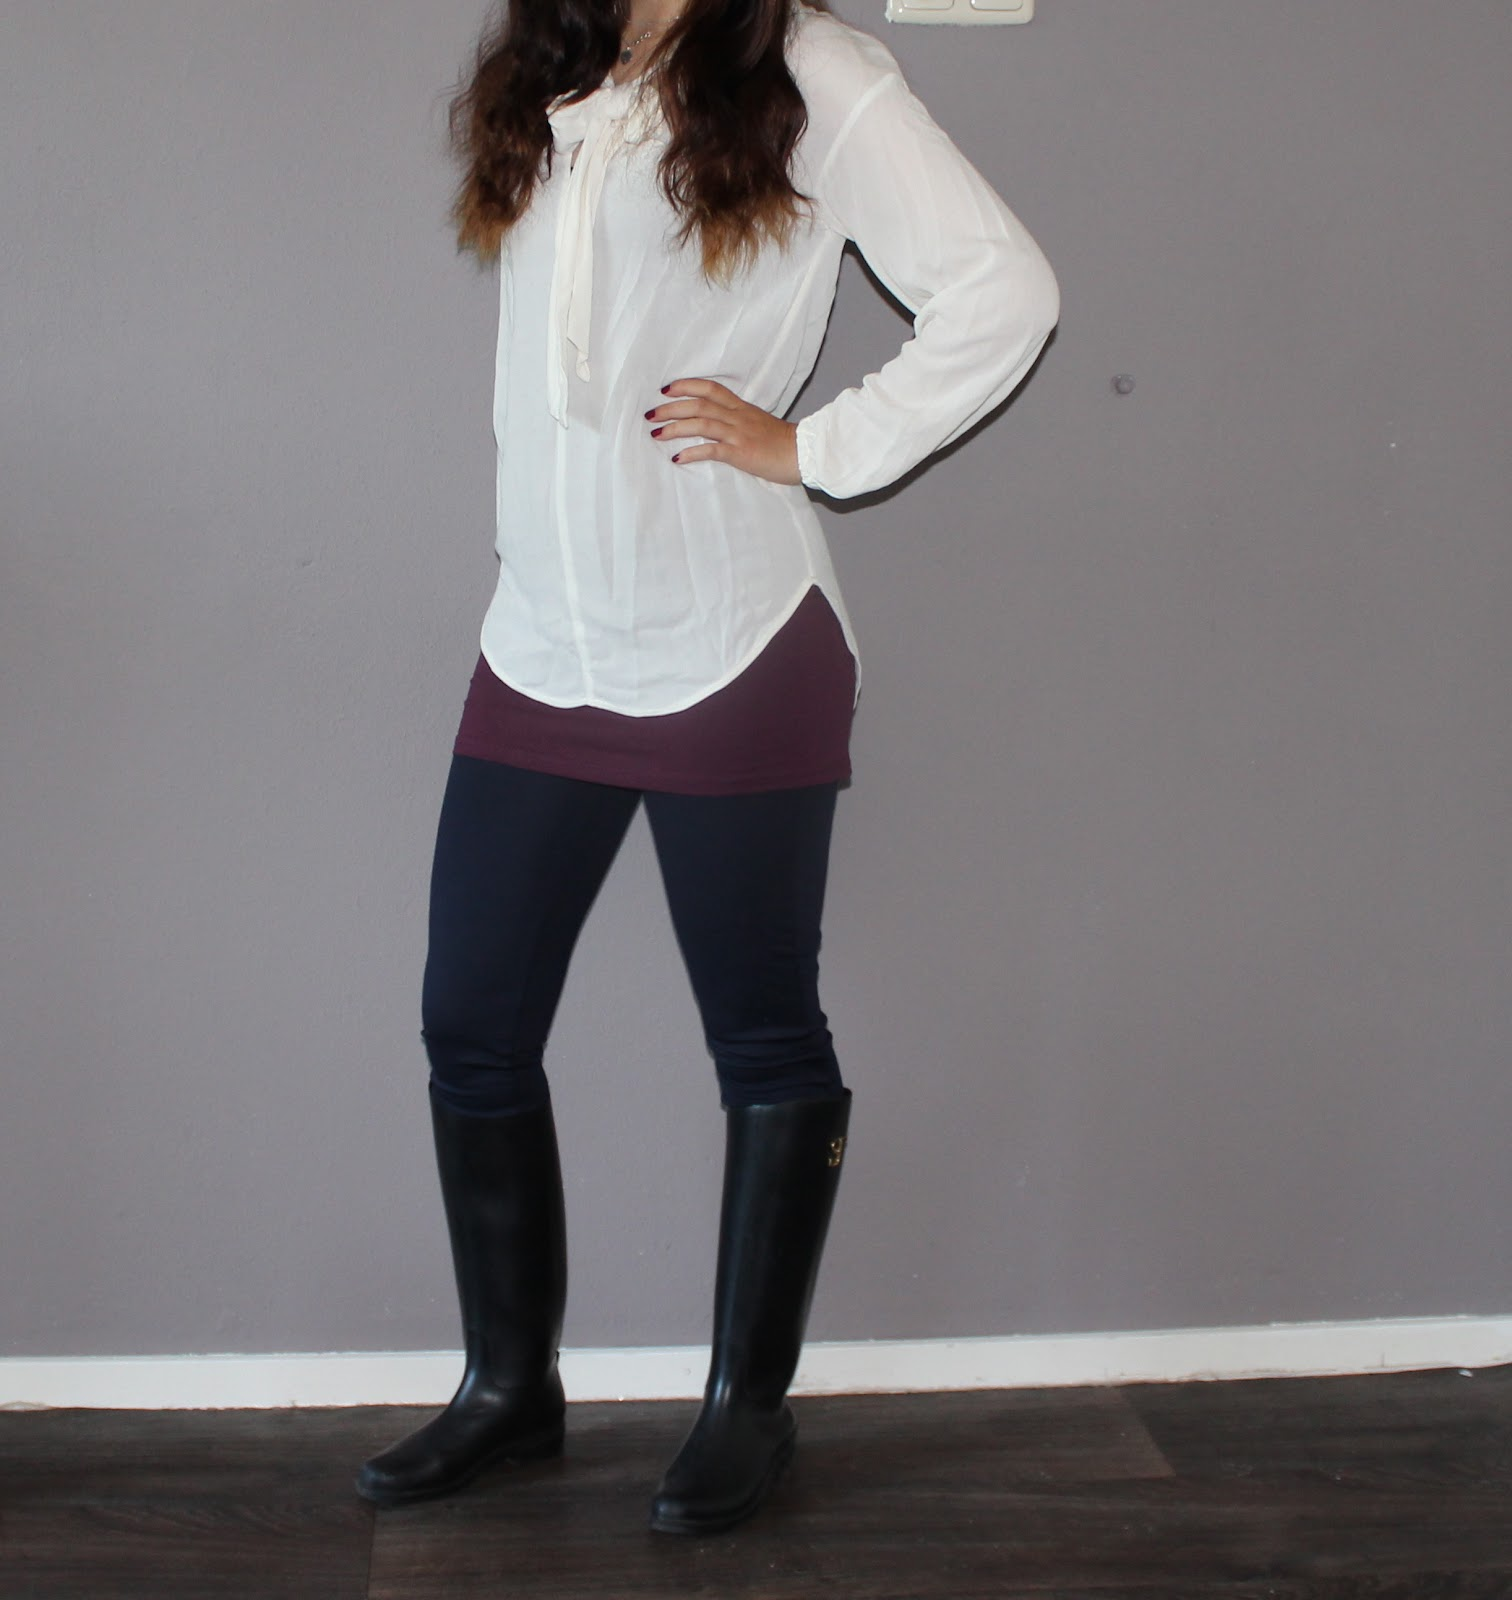 Juliau0026#39;s Fashion Minute white bow oxblood top u0026u0026 navy blue leggings.